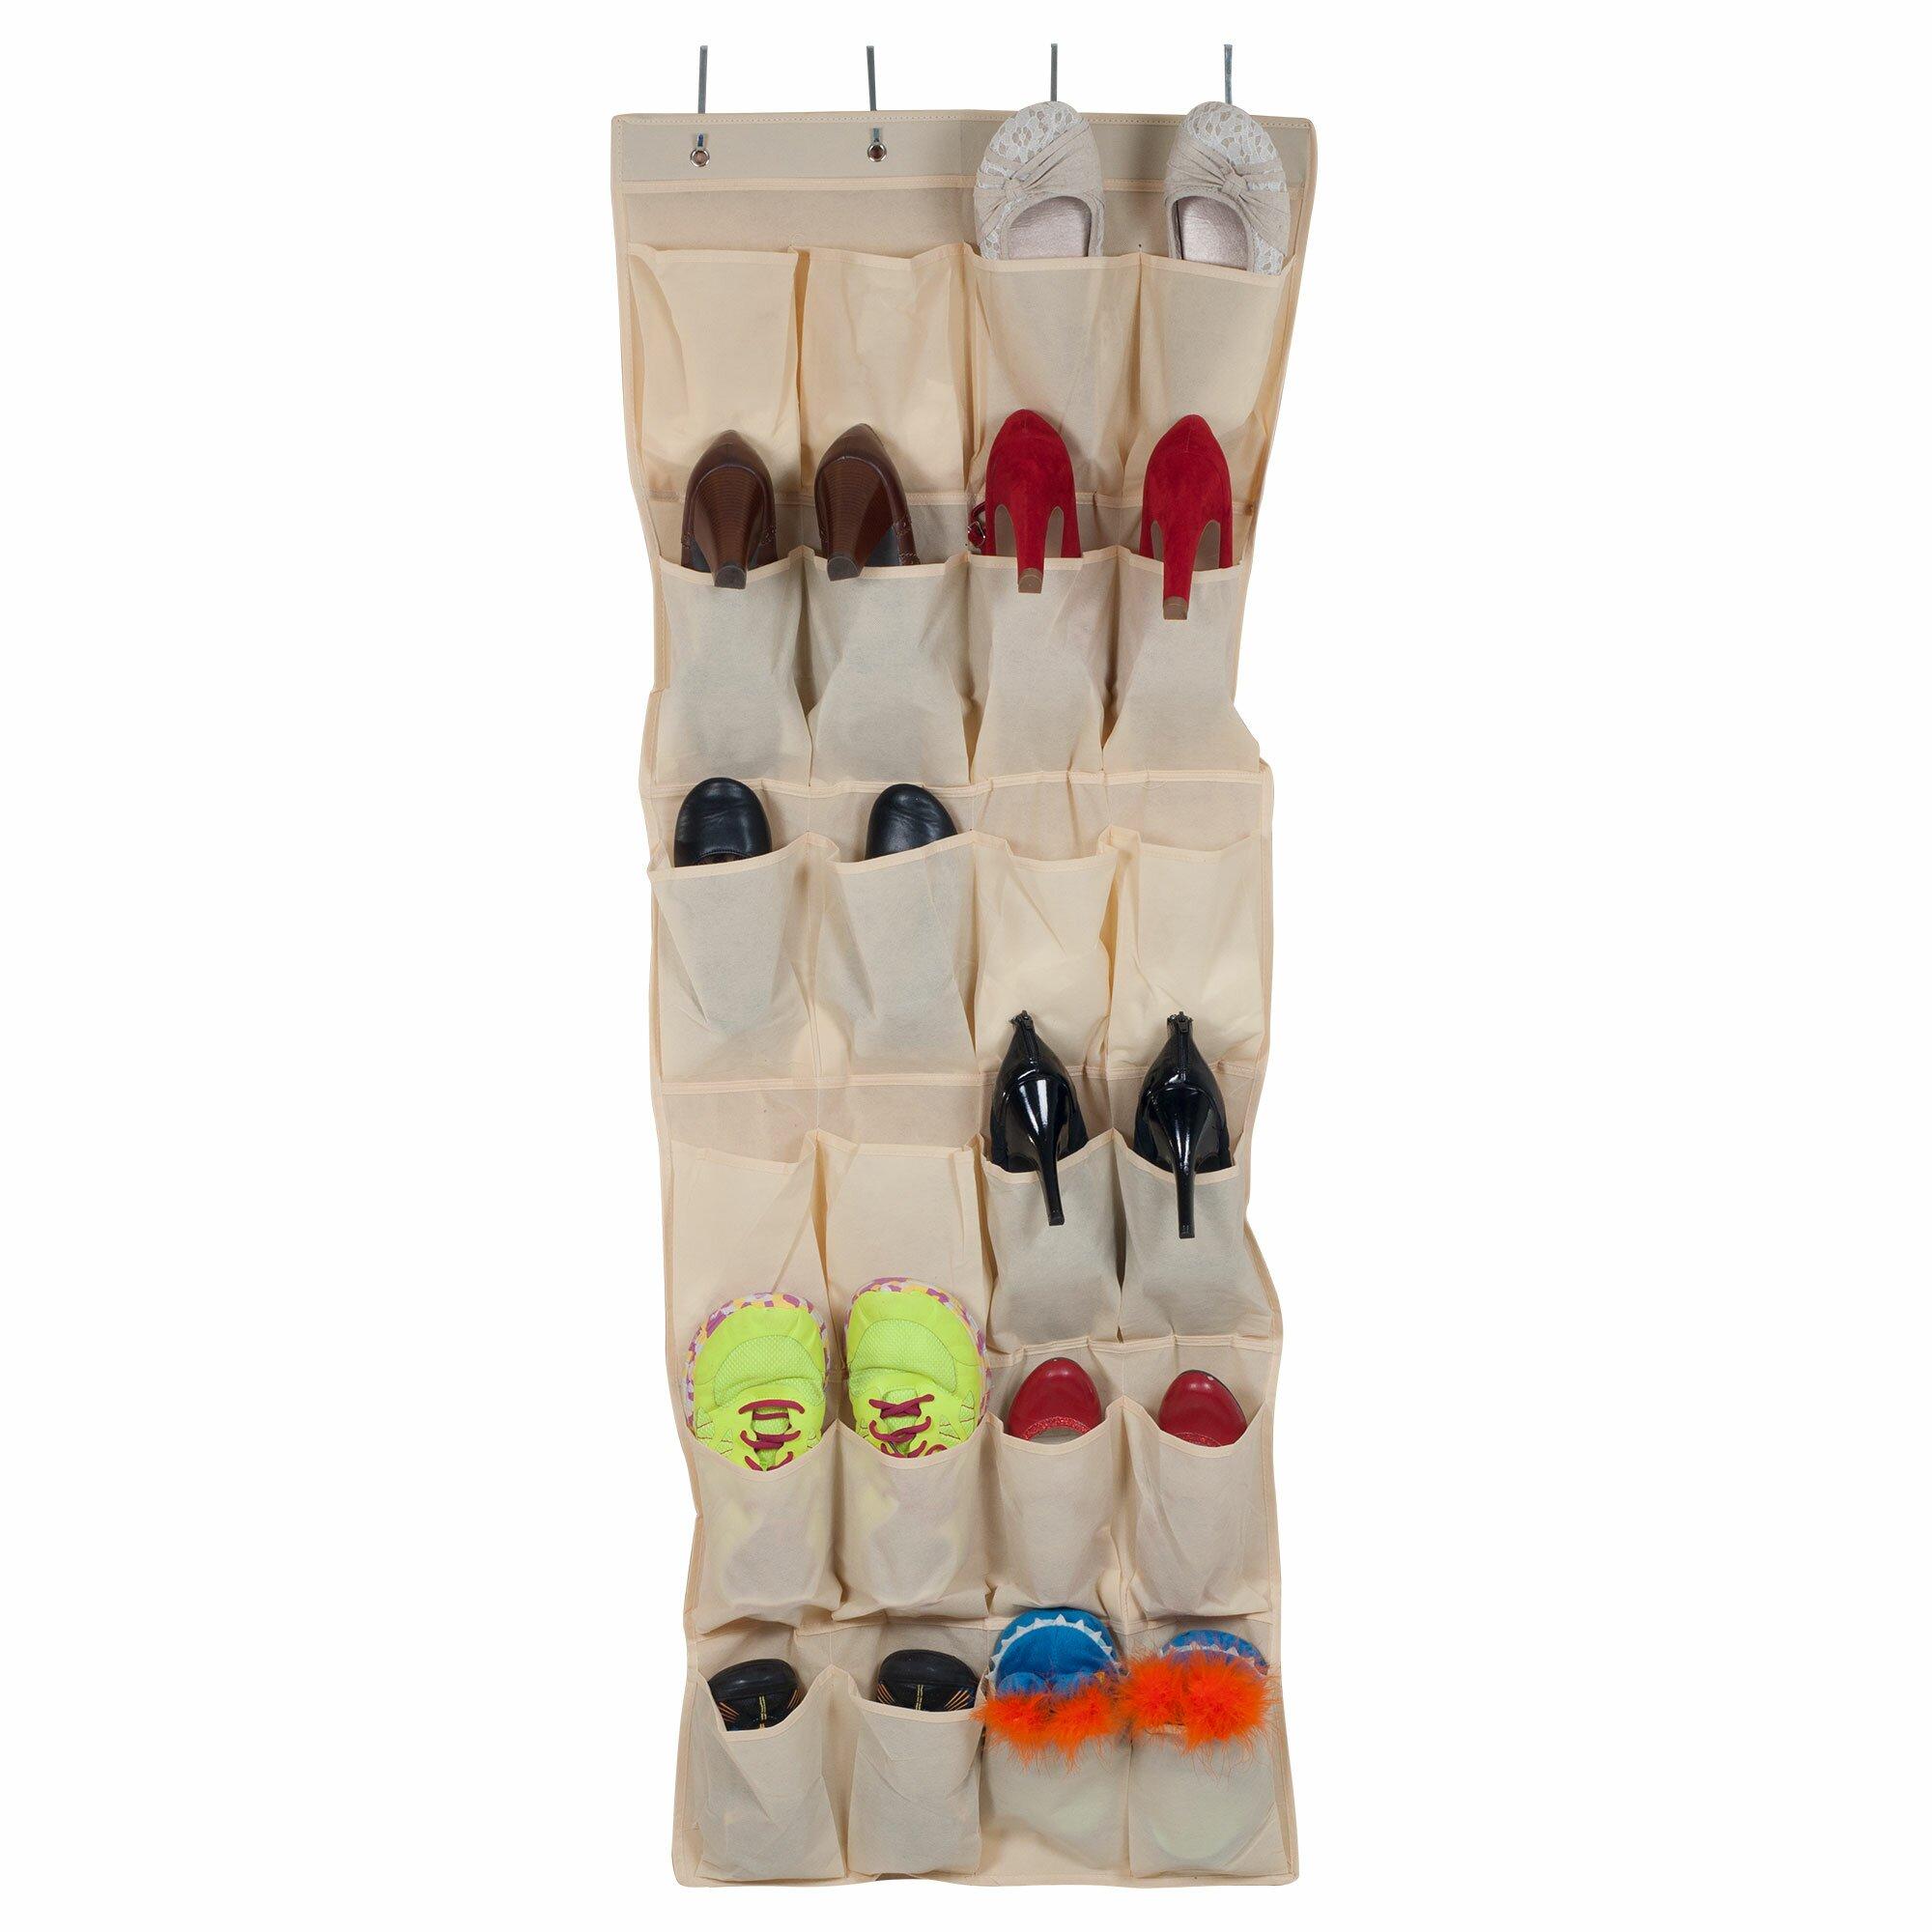 Lavish home 24 pocket overdoor shoe organizer reviews for 12 pocket over the door shoe organizer